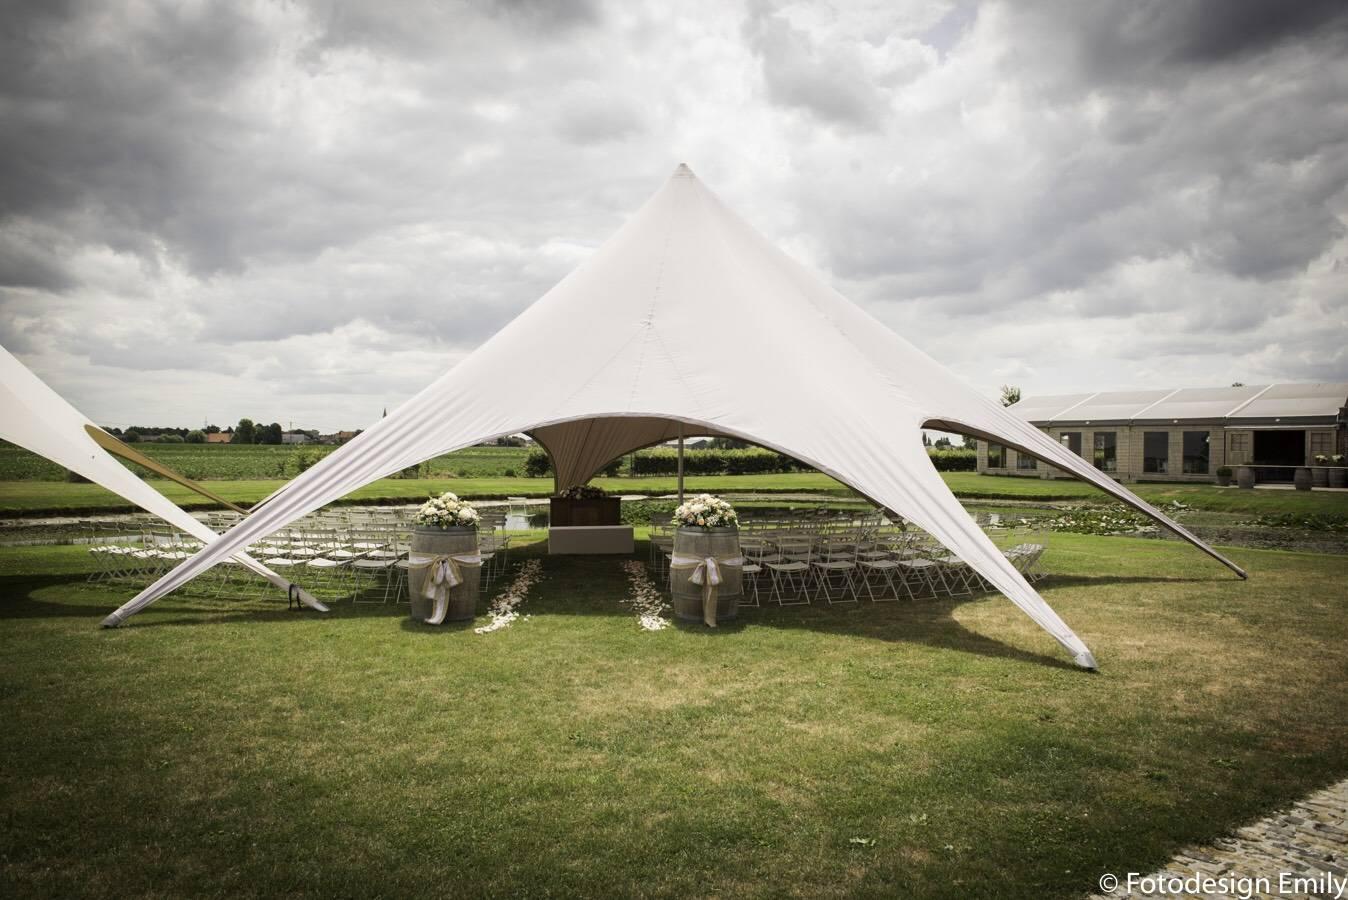 House of Weddings Domein t Eikennest Feestzaal West-Vlaanderen Diksmuide Beerst 8